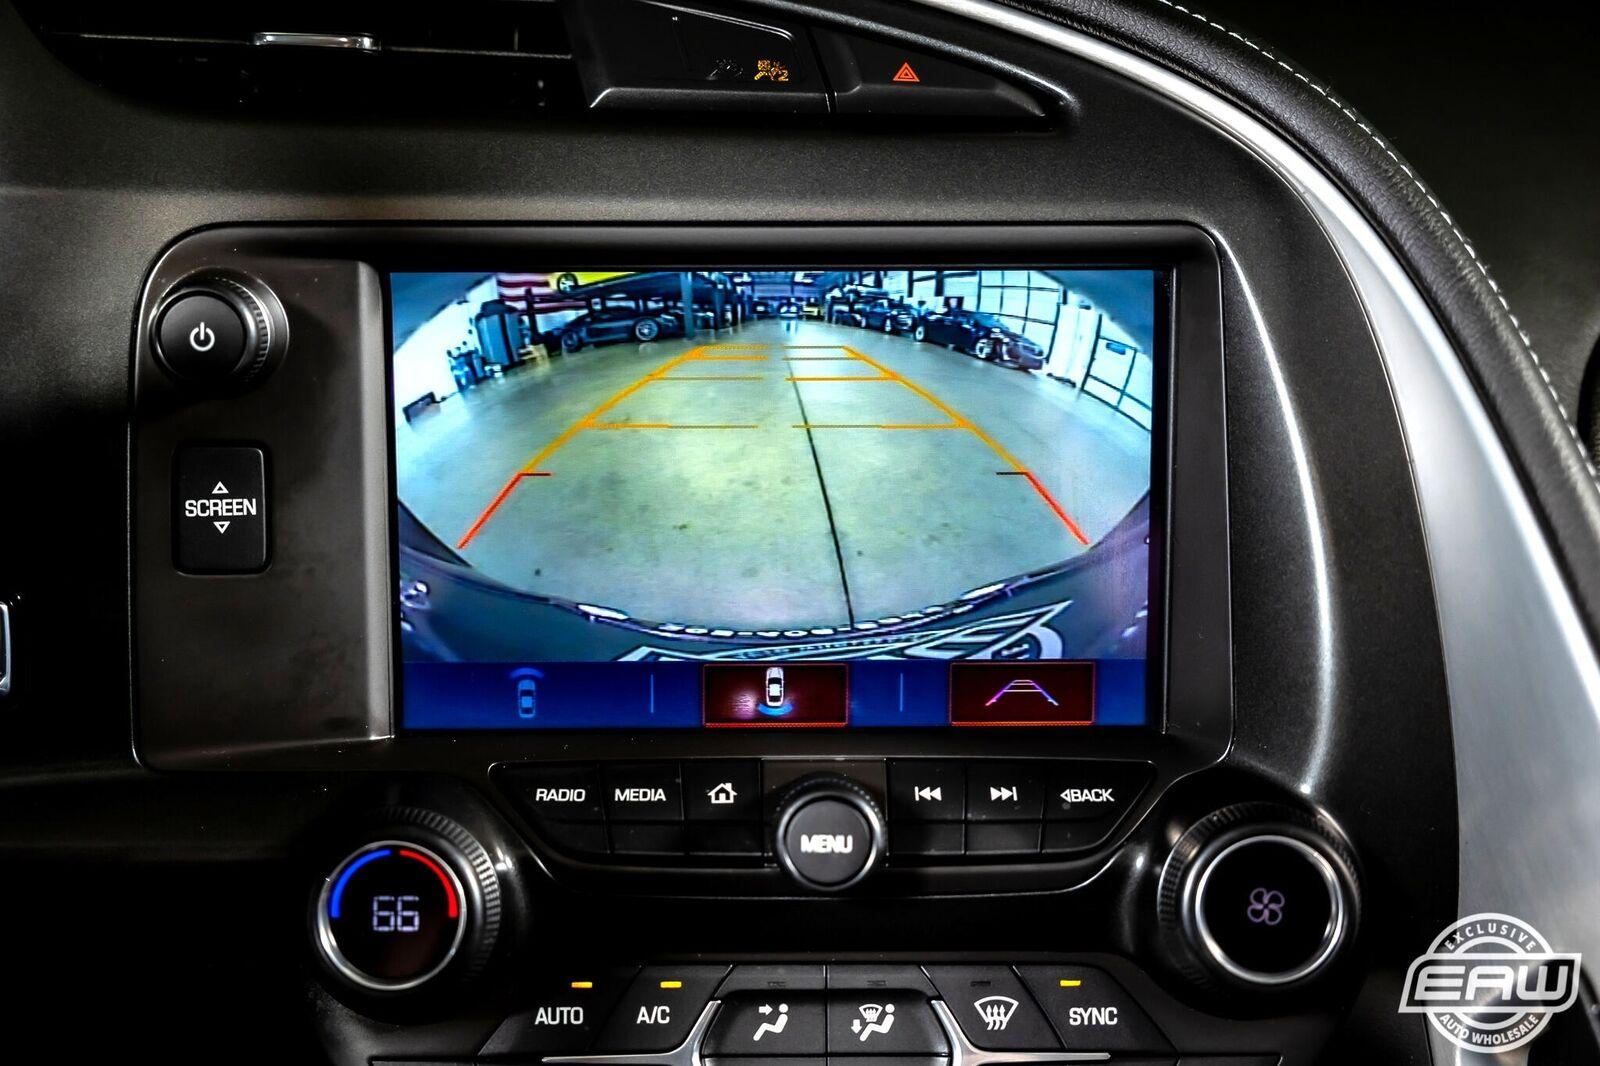 2019 Black Chevrolet Corvette Convertible 2LT | C7 Corvette Photo 8